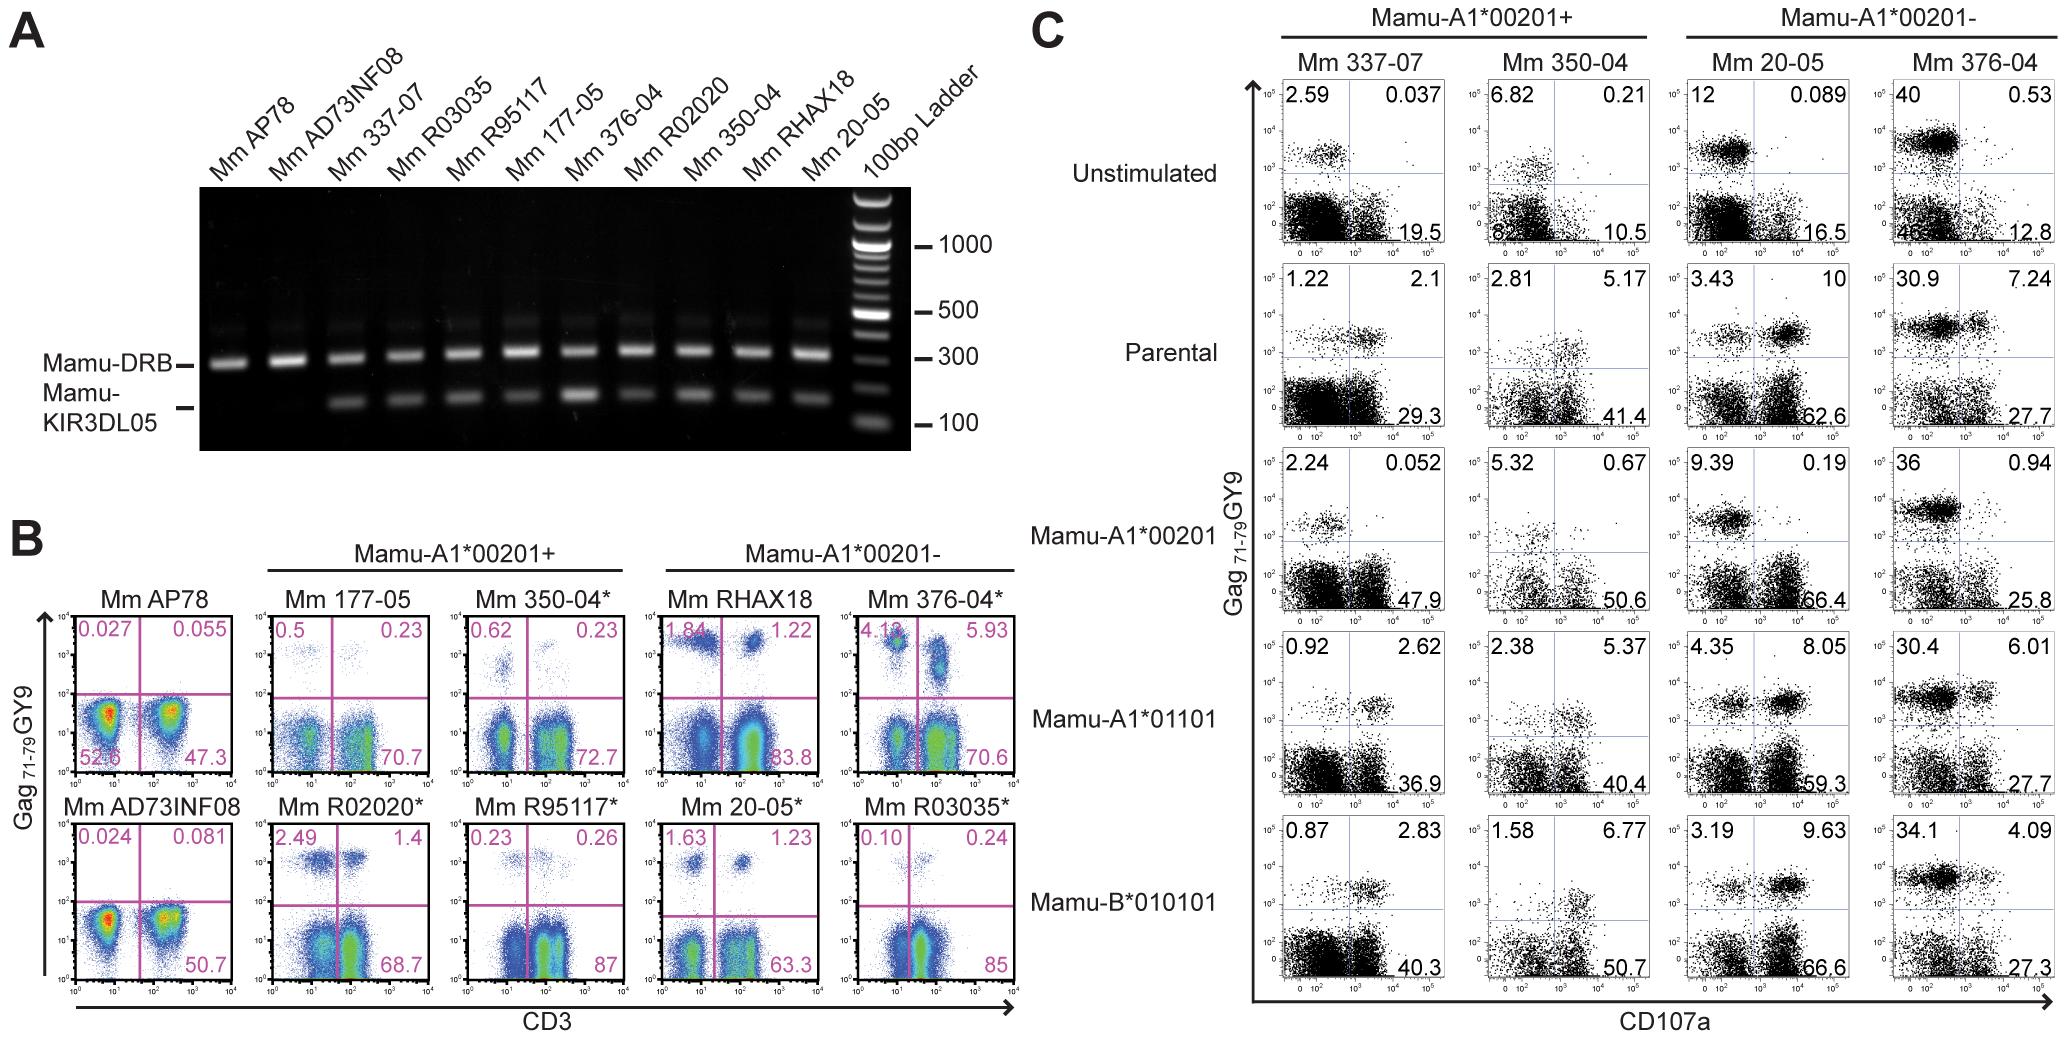 Mamu-A1*00201<sup>+</sup> target cells suppress the degranulation of tetramer-positive NK cells.